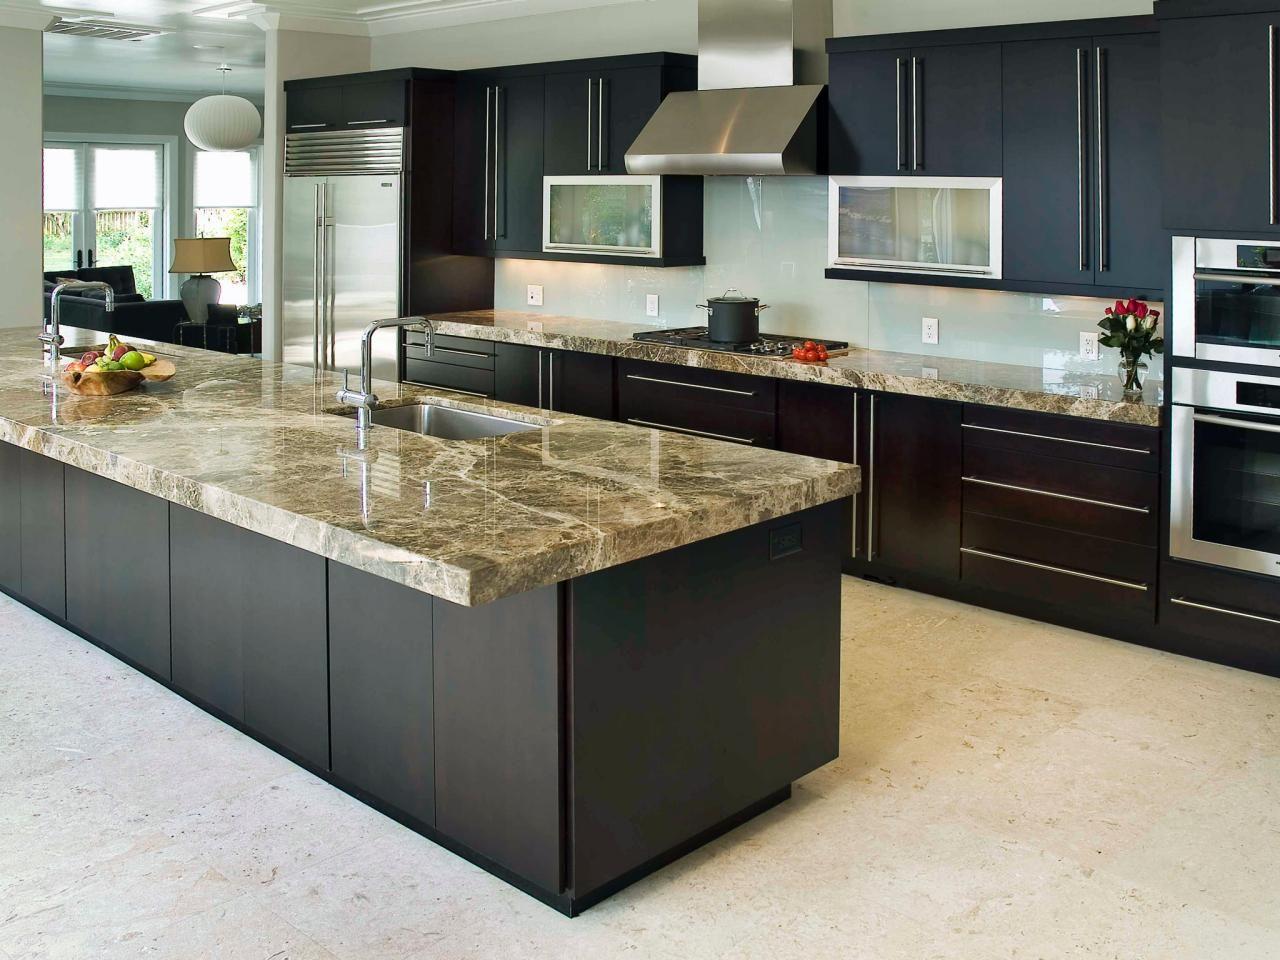 10 High End Kitchen Countertop Choices Kitchen Ideas Design